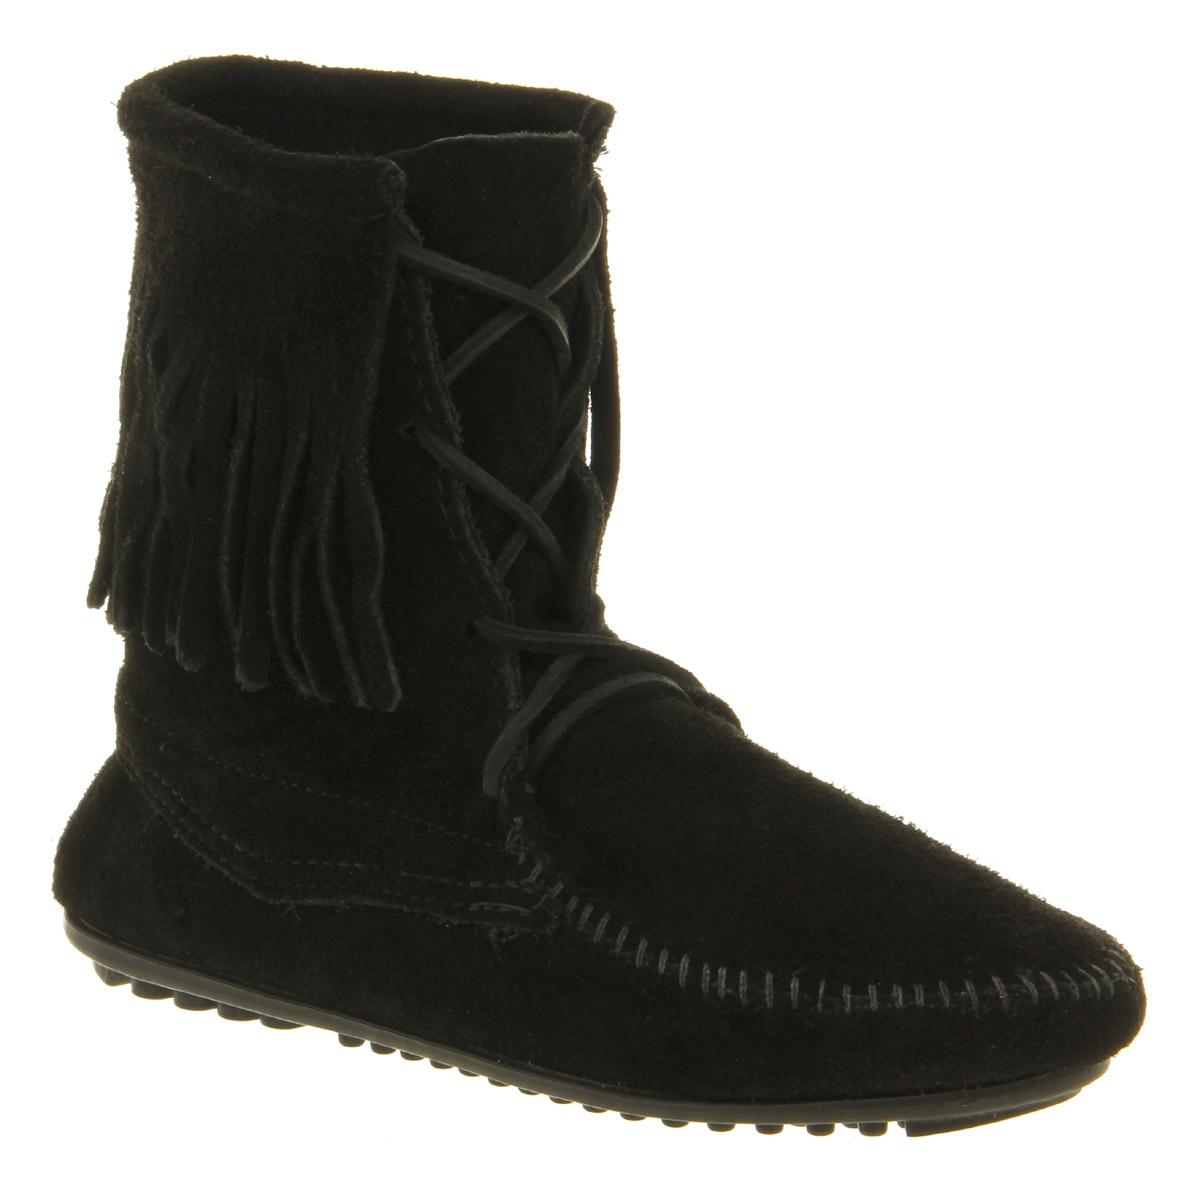 minnetonka trer tassle ankle boot black suede in black